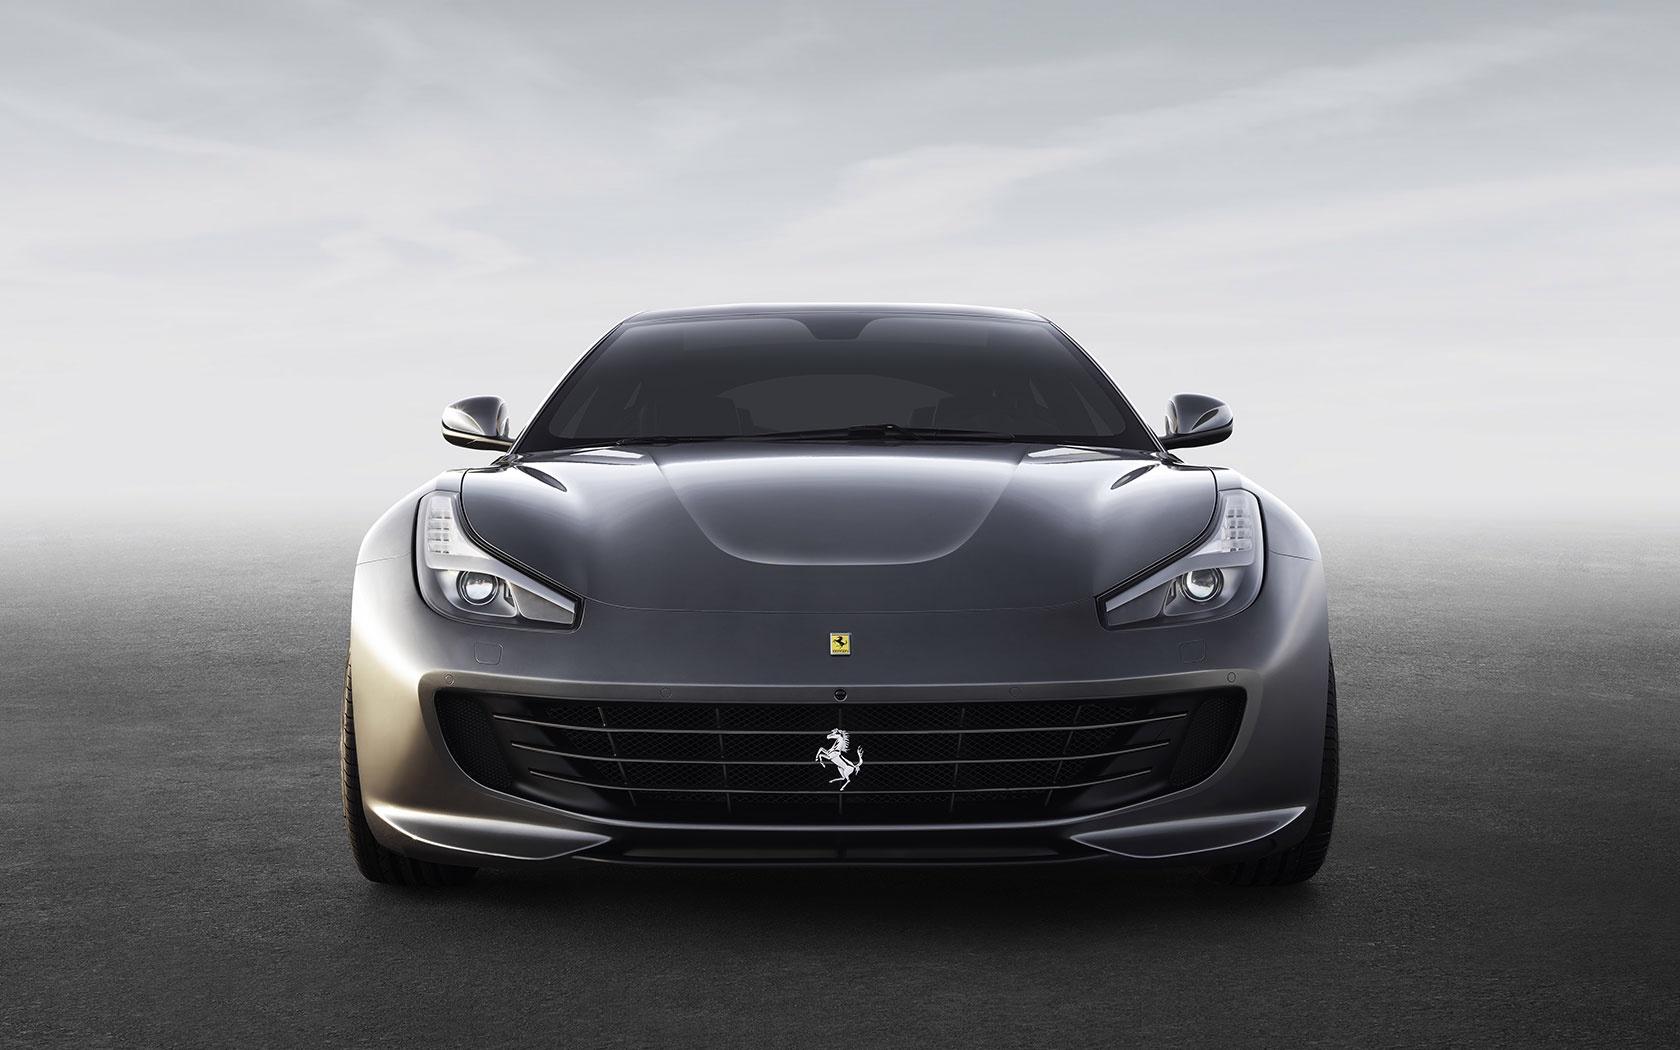 New-2019-Ferrari-GTC4LUSSO